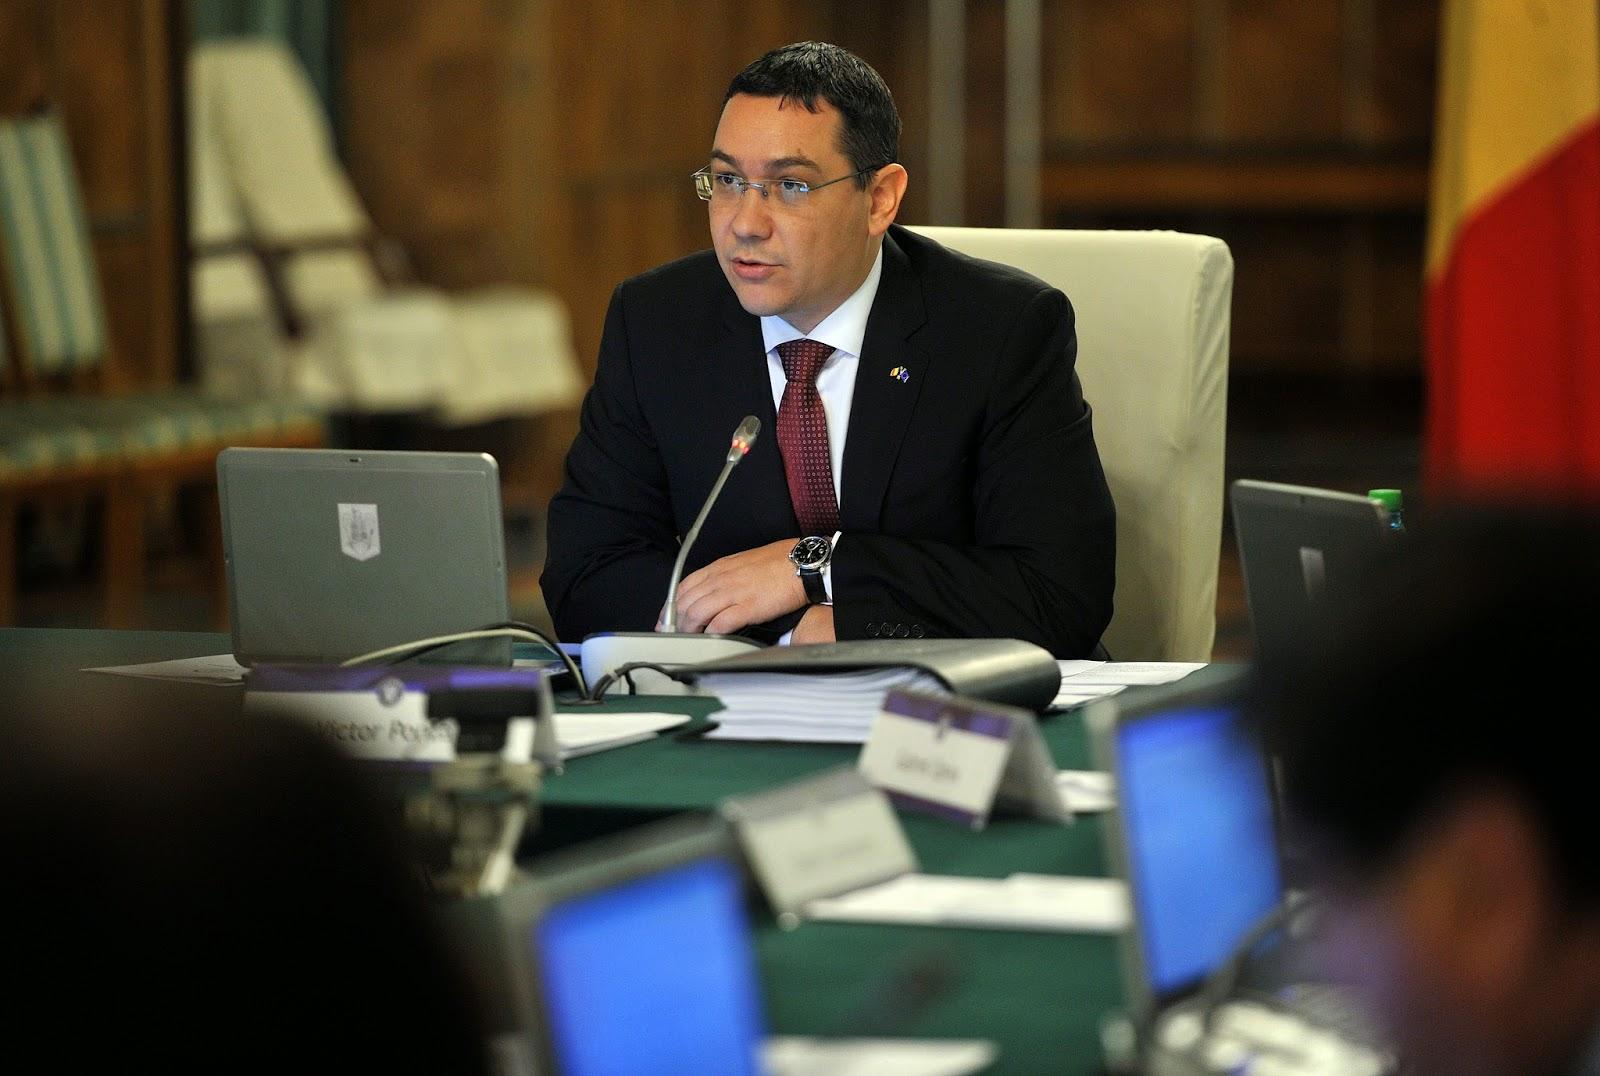 Victor Pițurcă, Traian Băsescu, Klaus Johannis, román kormány, Ponta-kormány, SZDP, románia, politika,